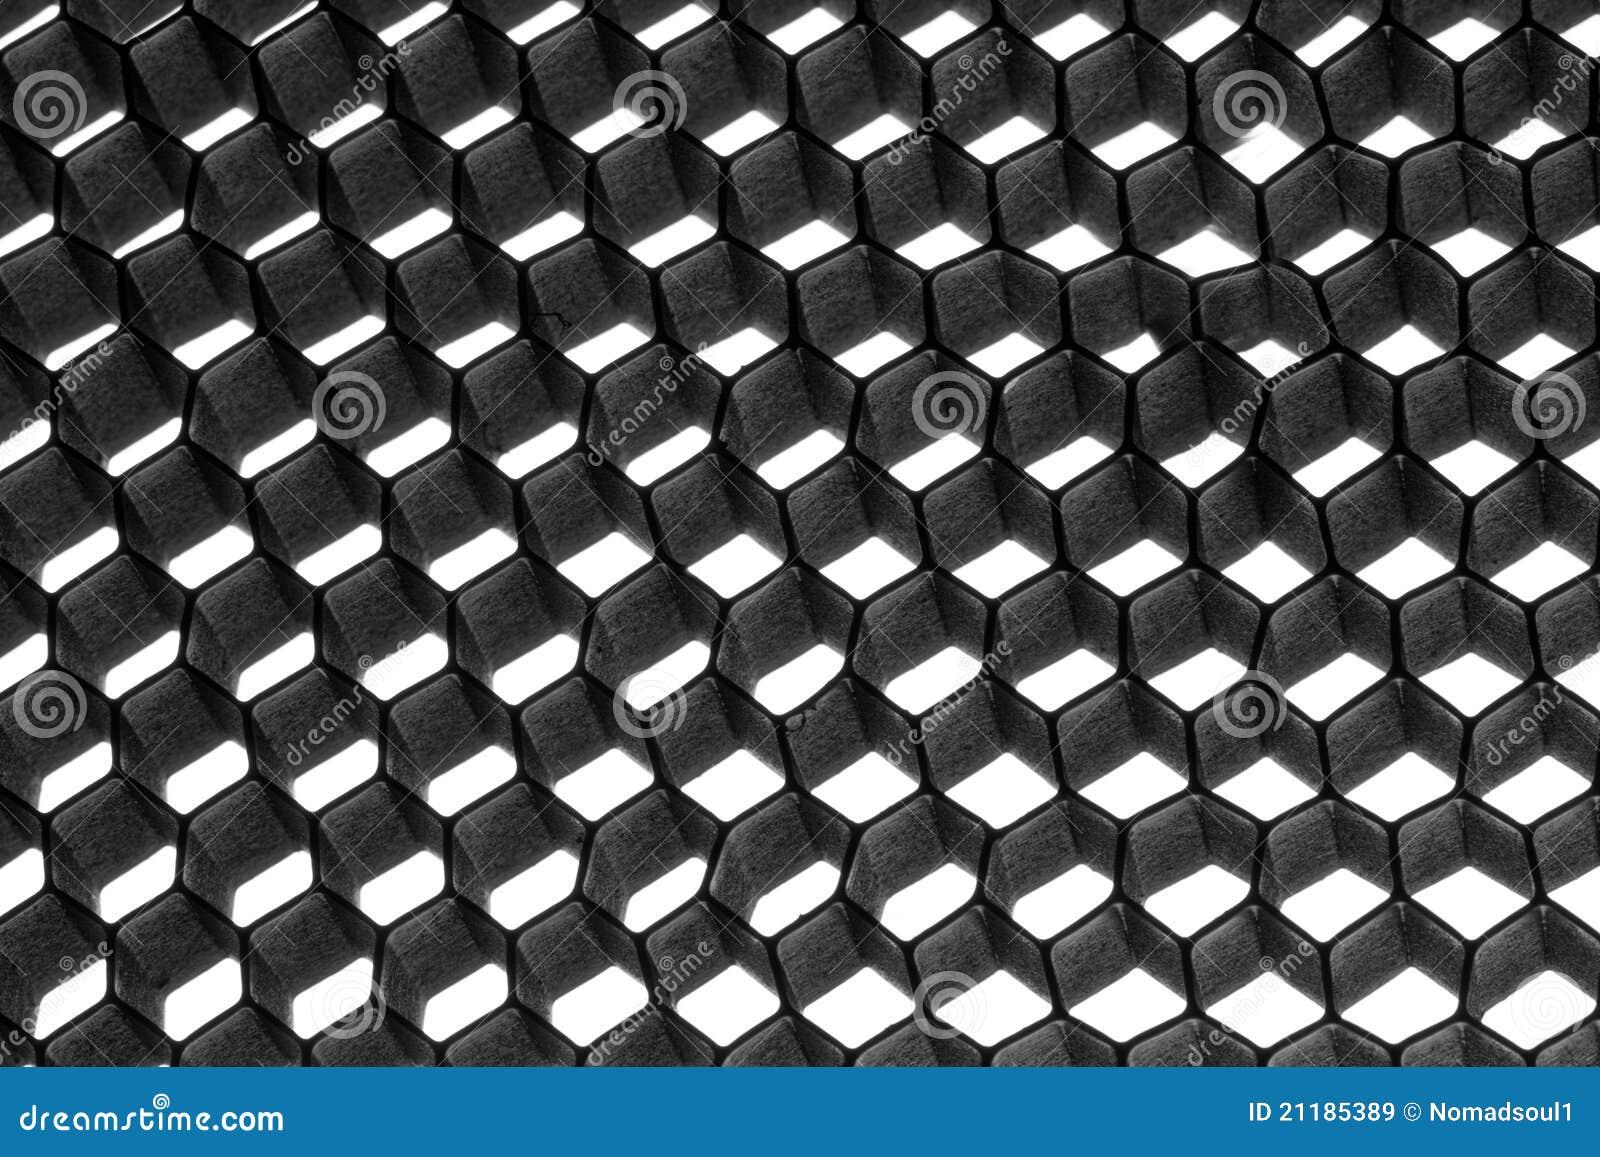 Abstract metallic hexagon mesh